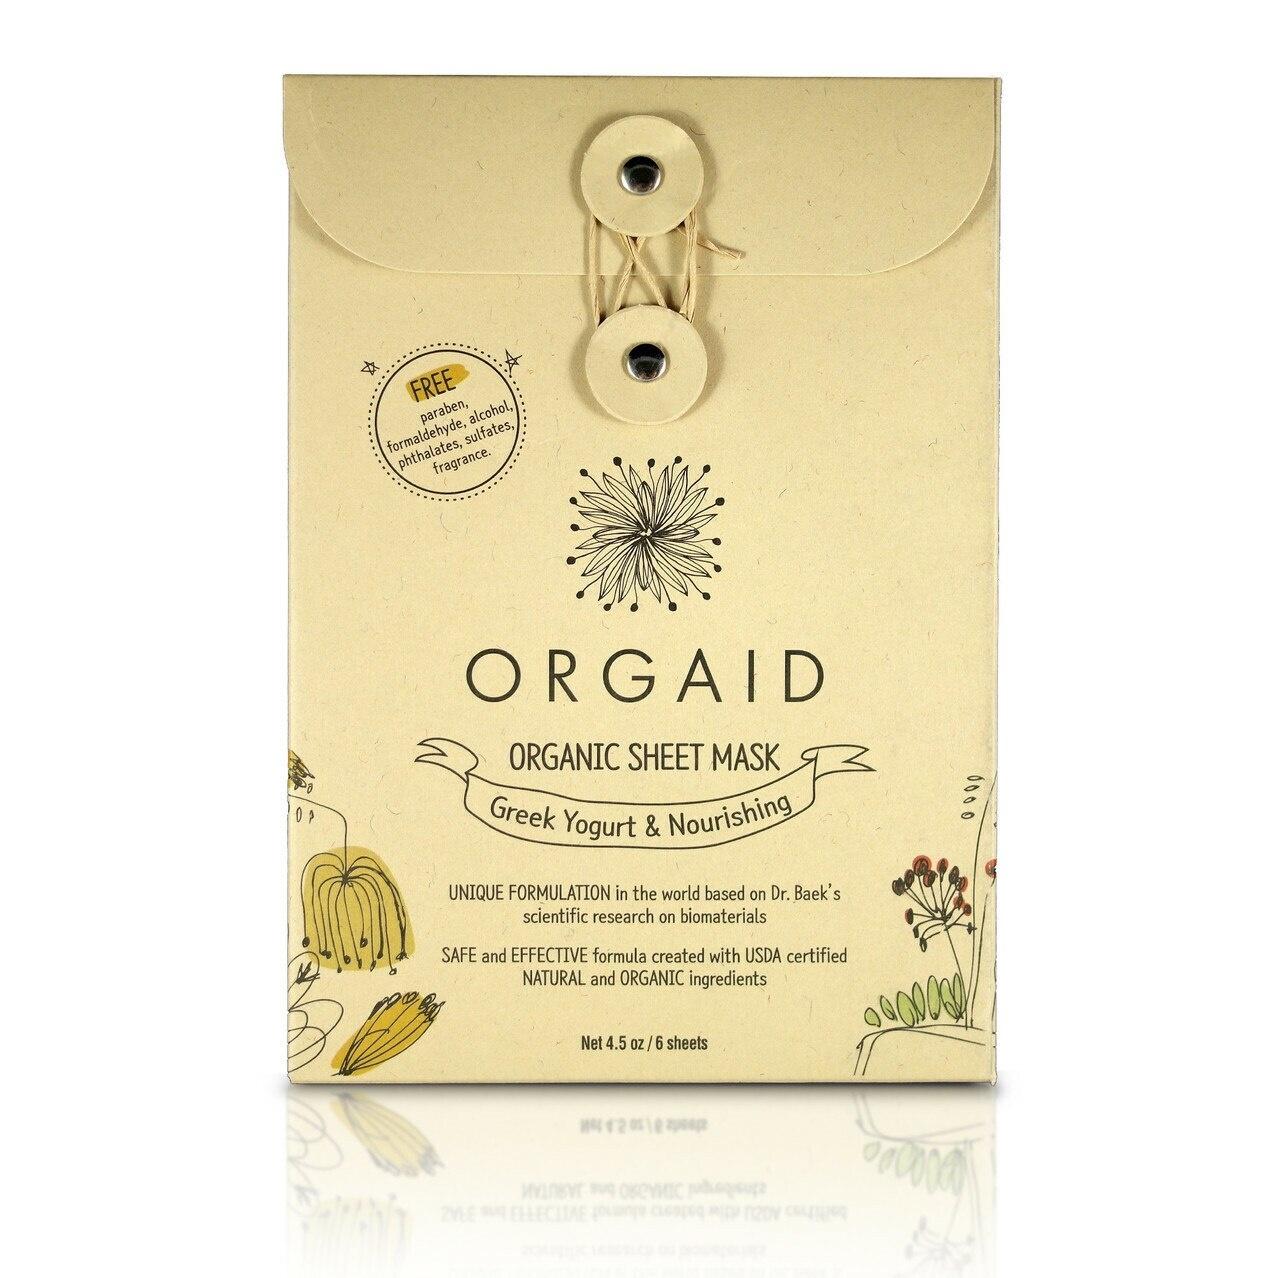 Greek Yogurt & Nourishing Organic Sheet Mask-3